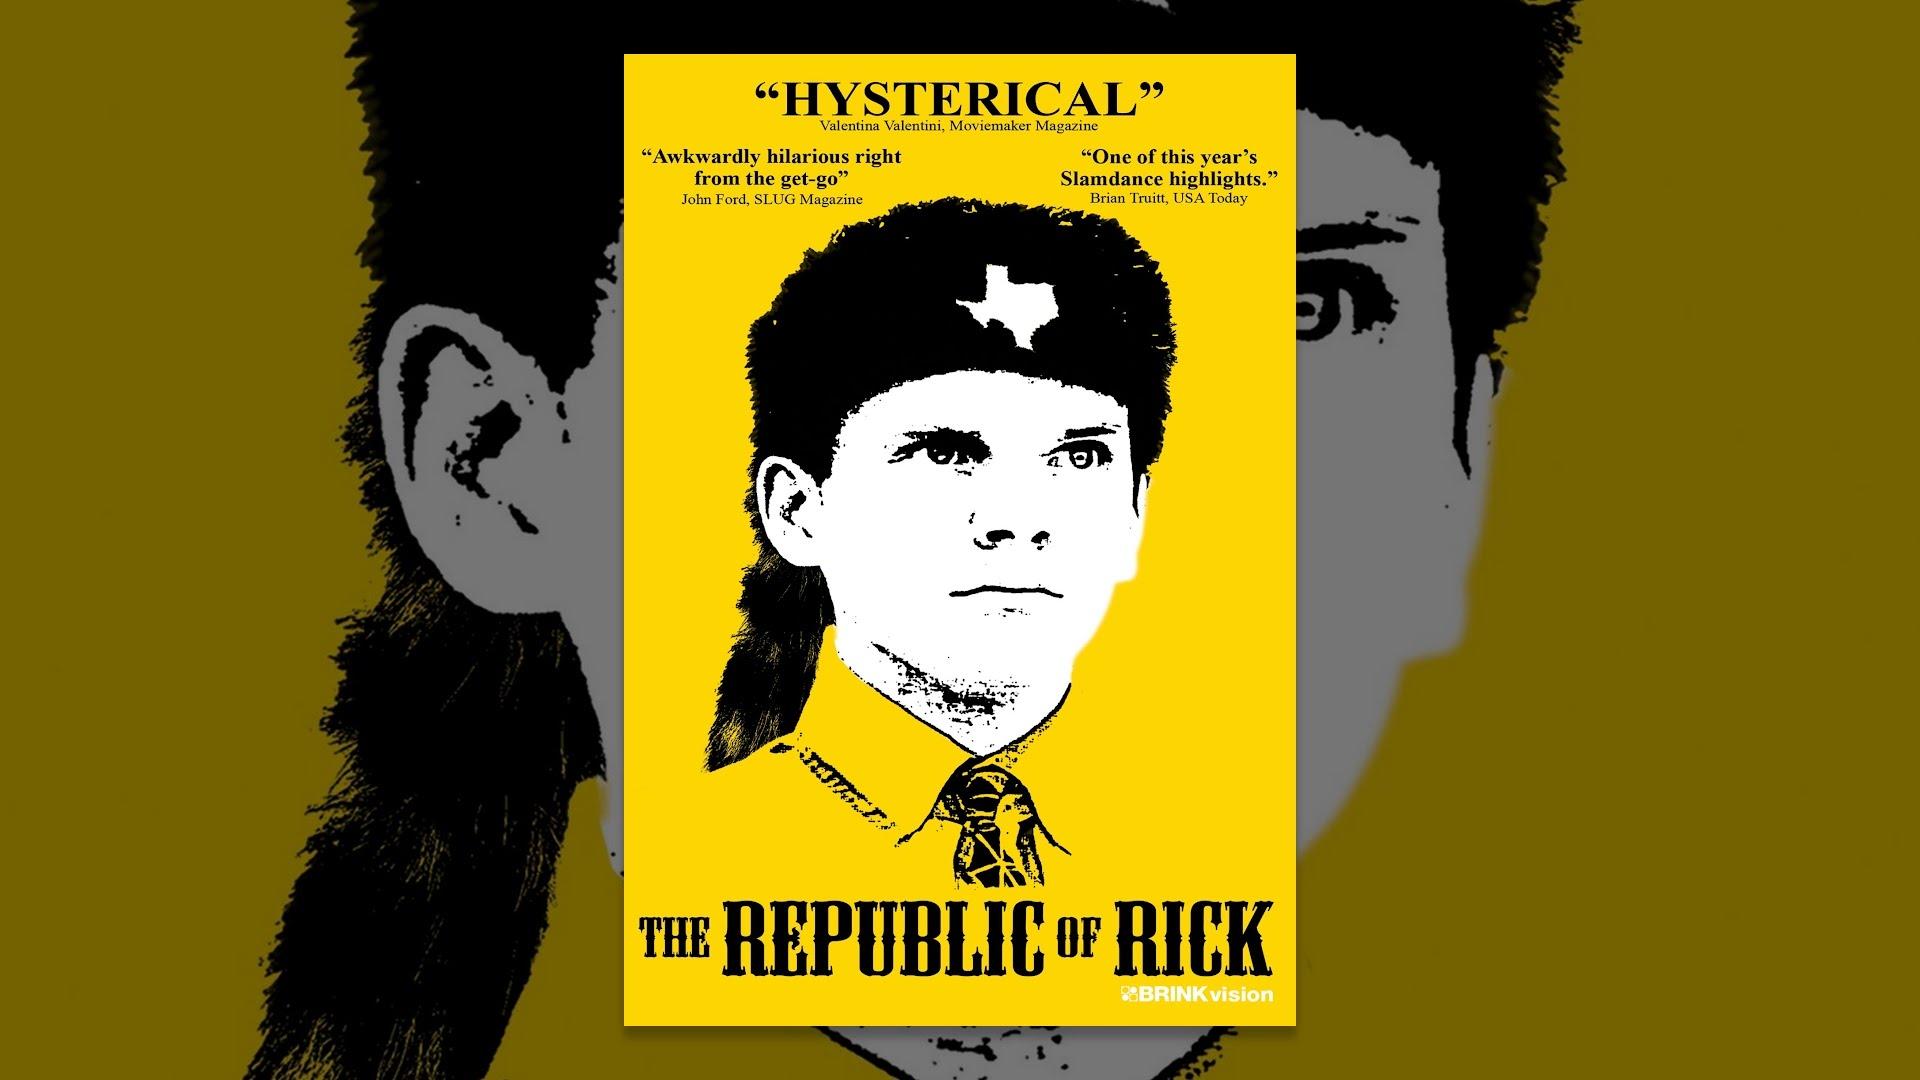 The Republic Of Rick